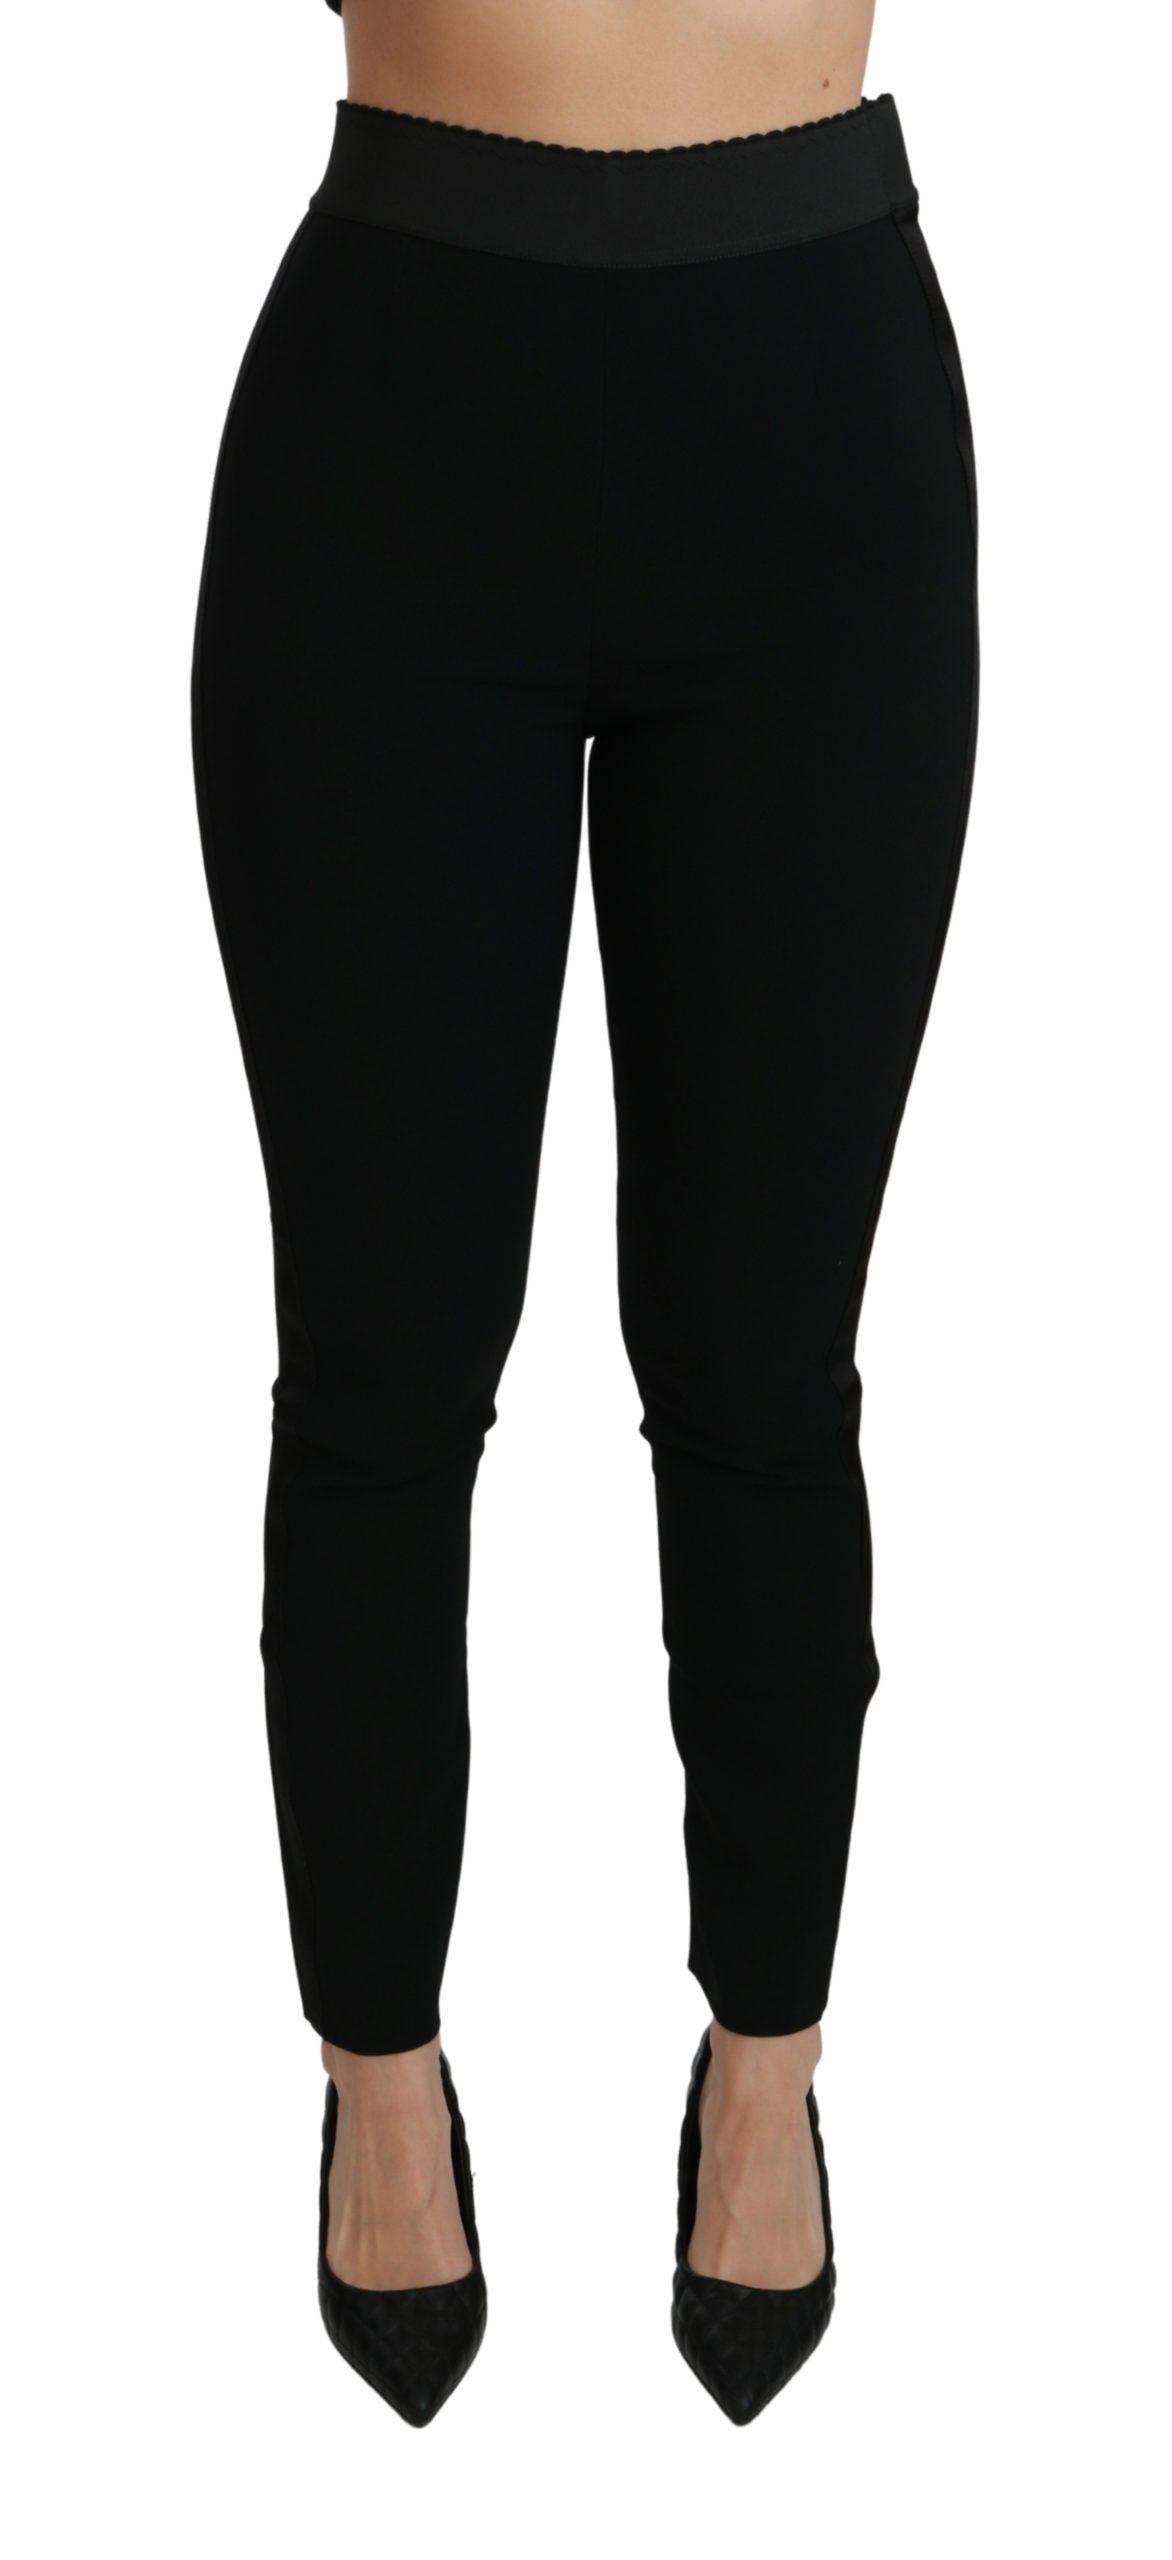 Dolce & Gabbana Women's Skinny High Waist Stretch Trouser Black PAN70894 - IT38 XS